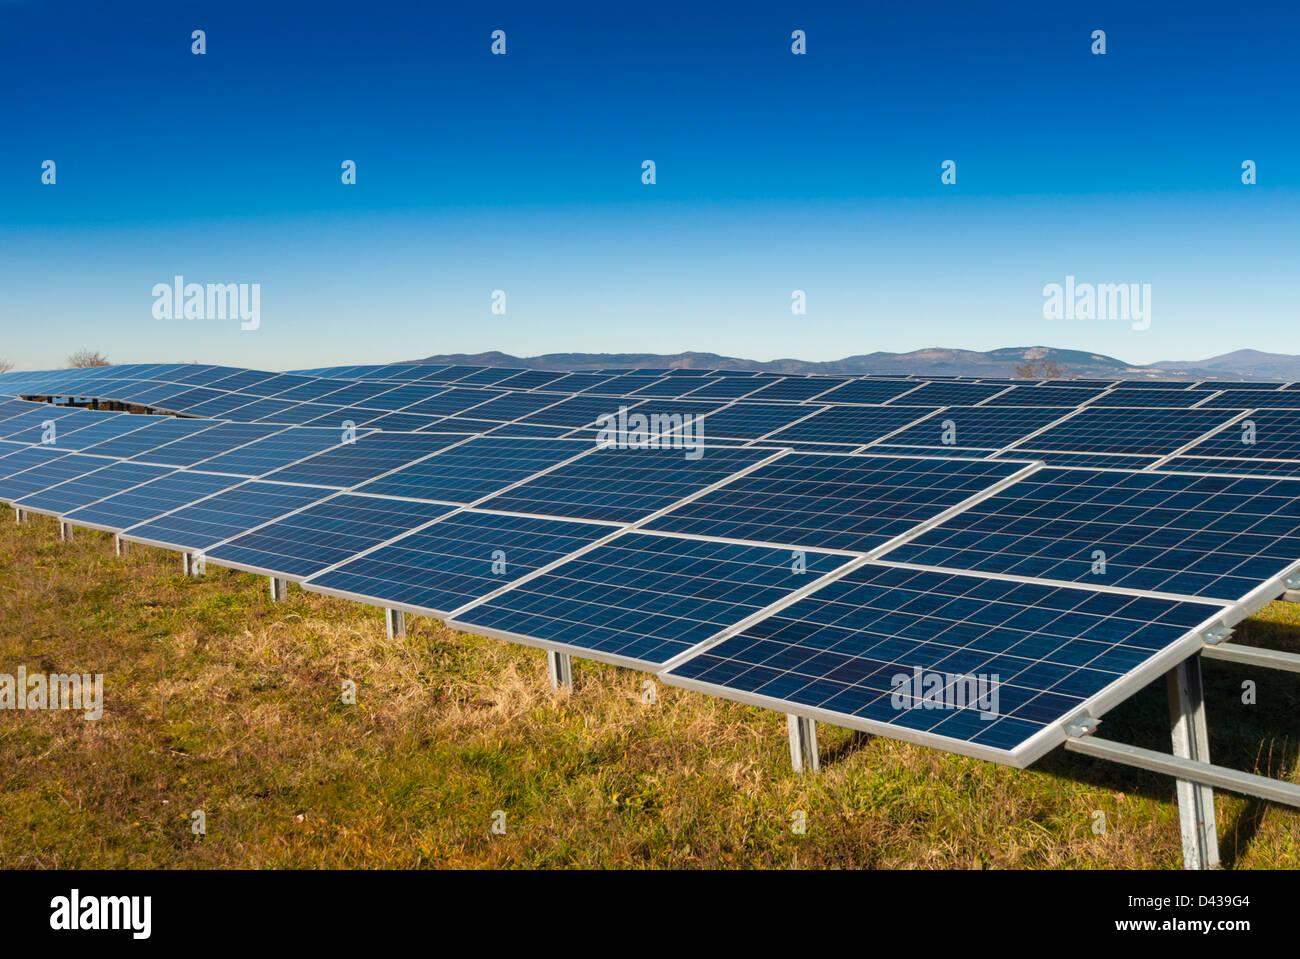 Electricity generating solar panel - Stock Image